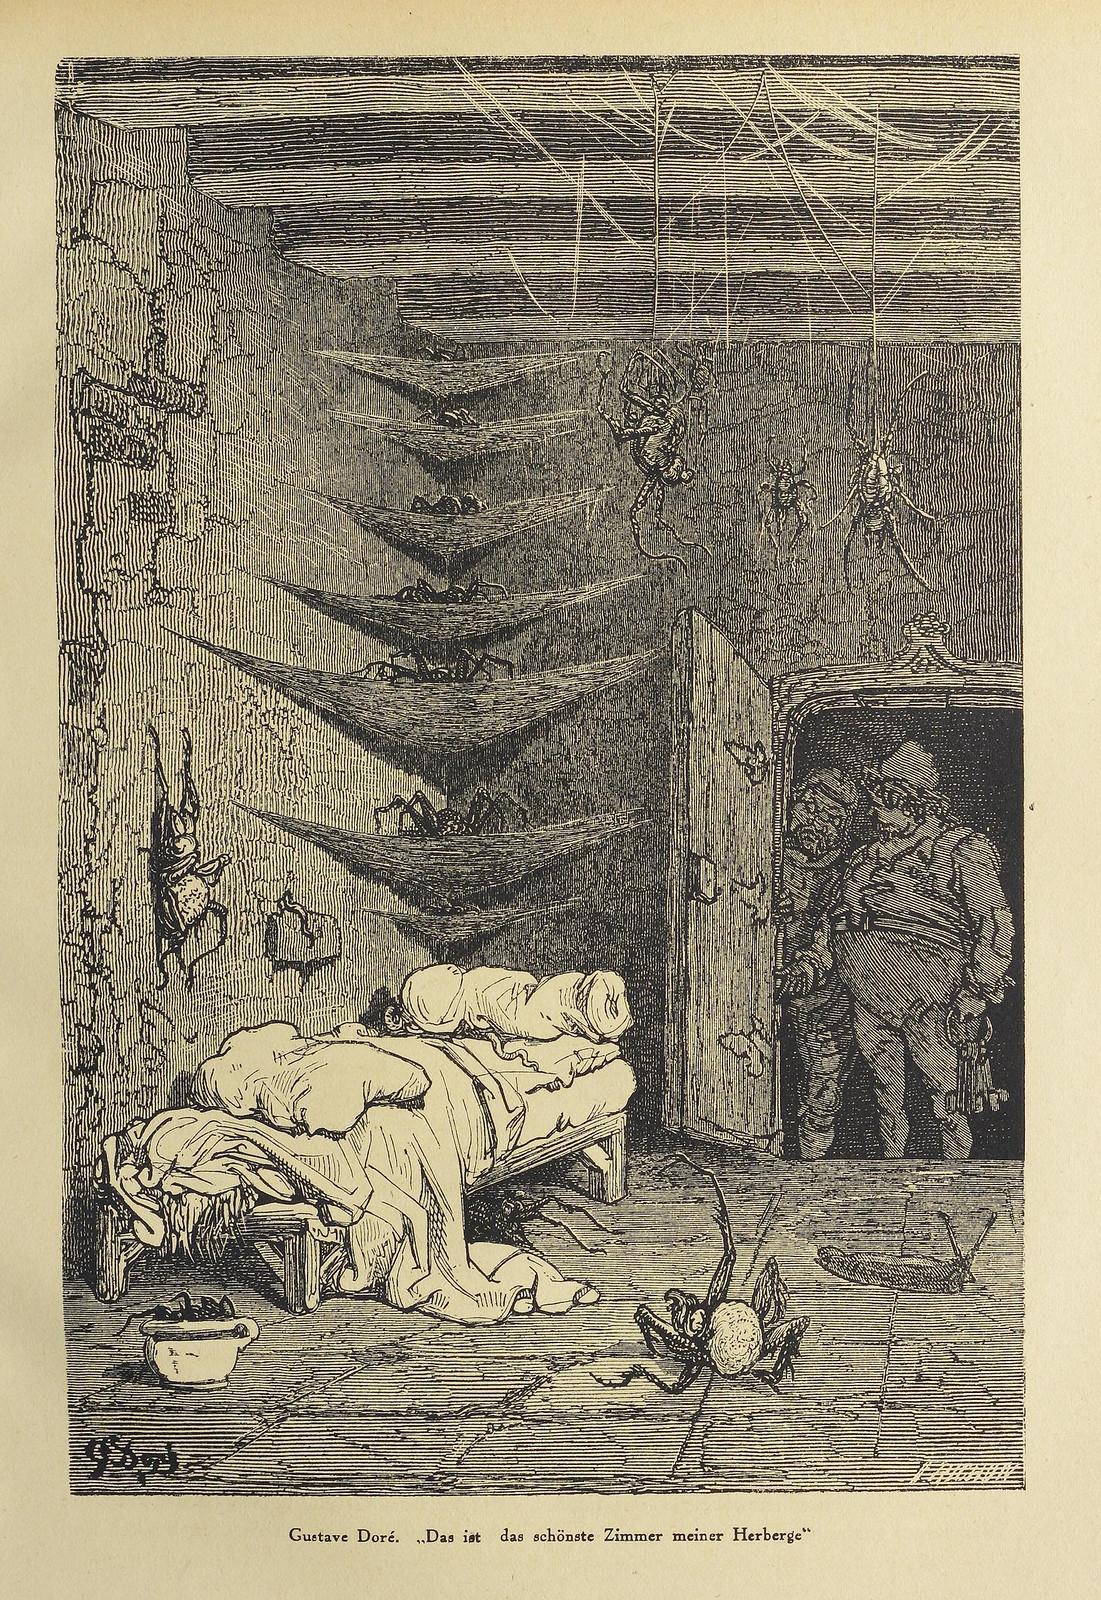 Der Orchideengarten - 1920, Gustave Dore